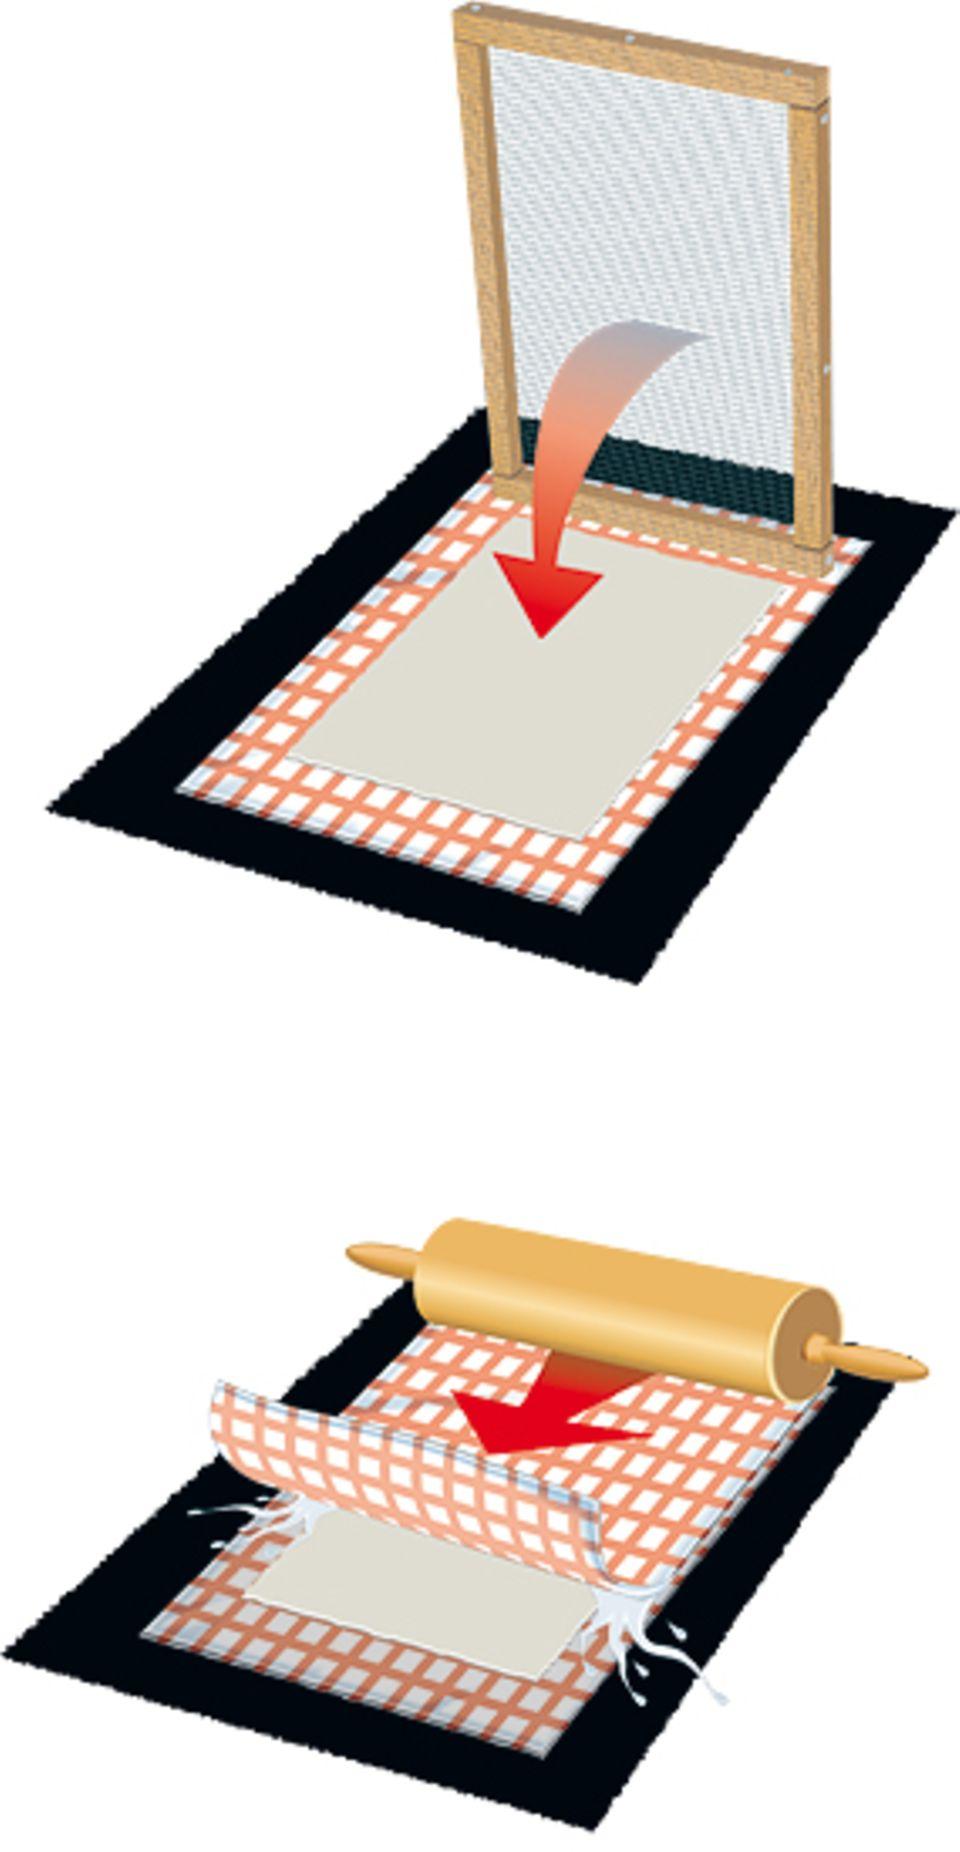 Bastelanleitung: Papier selber machen